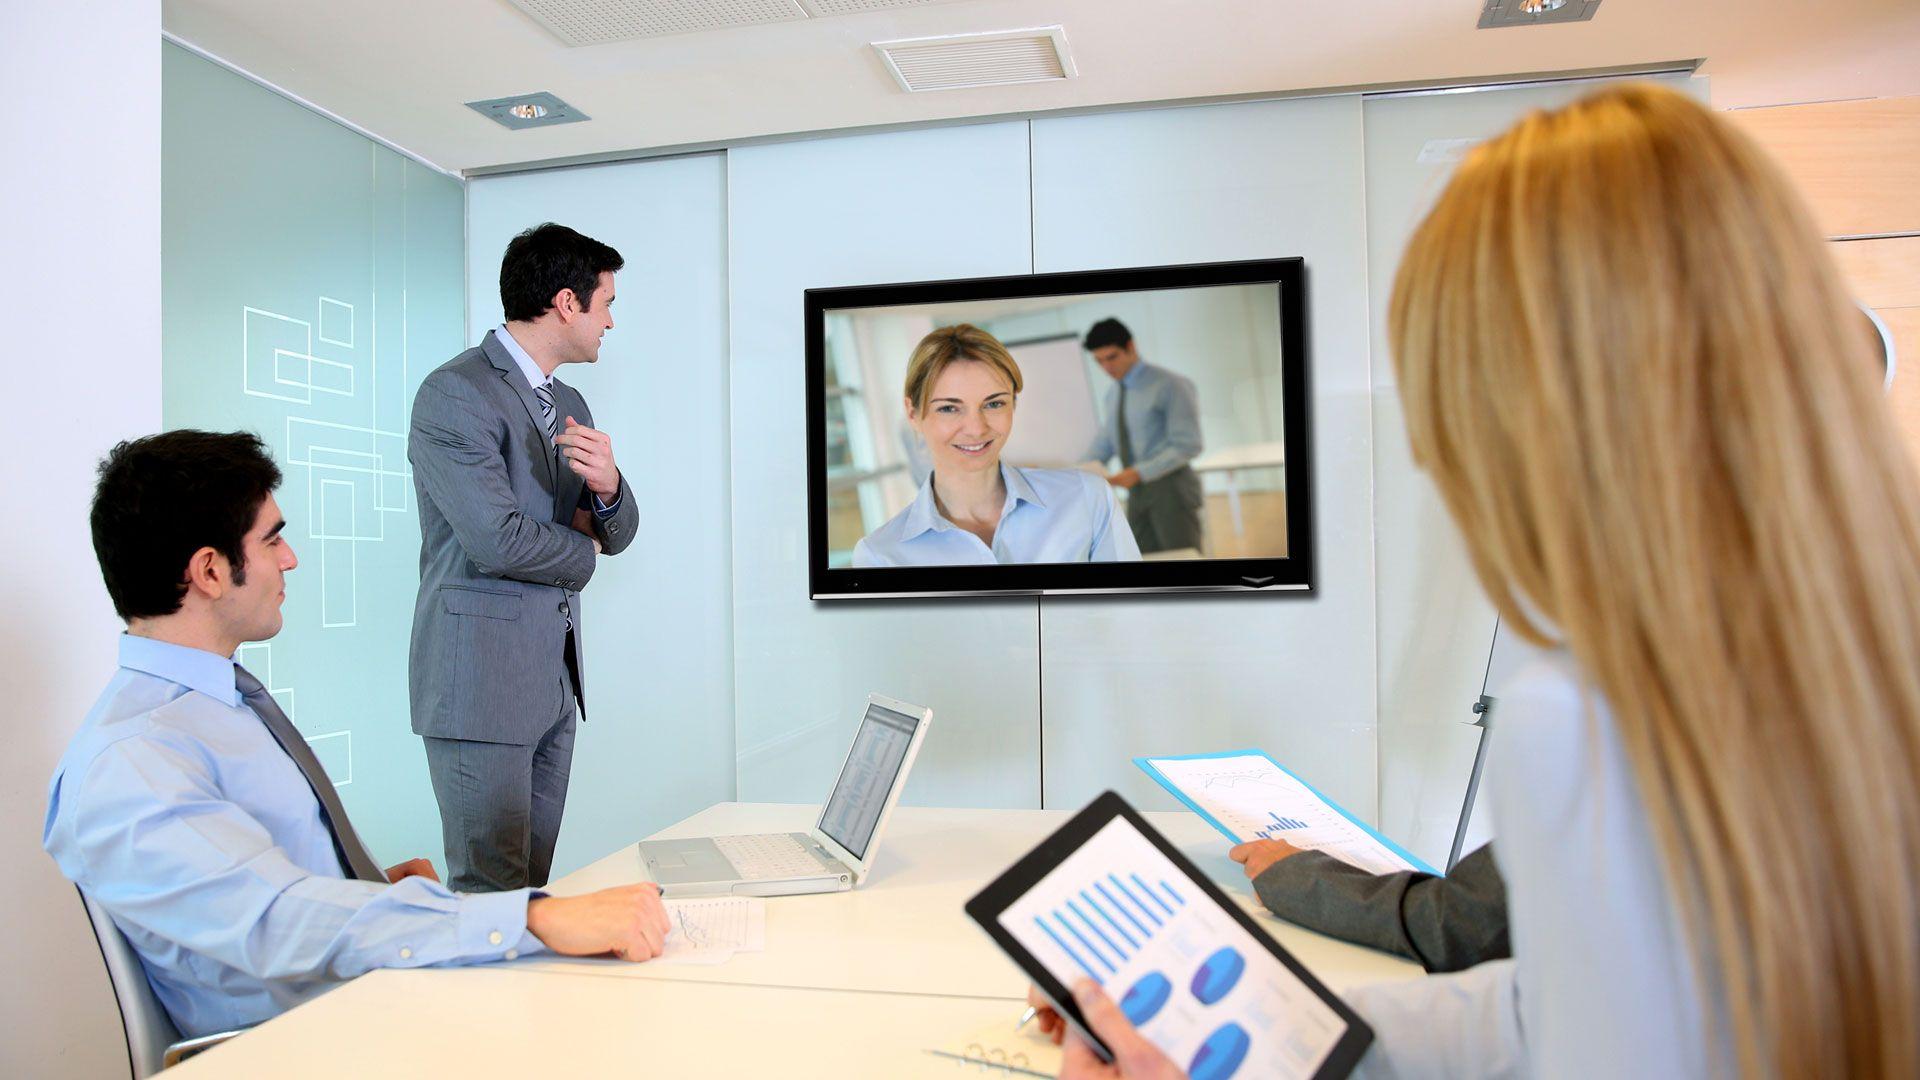 videoconferencia ricoh header - Videoconferencia Ricoh